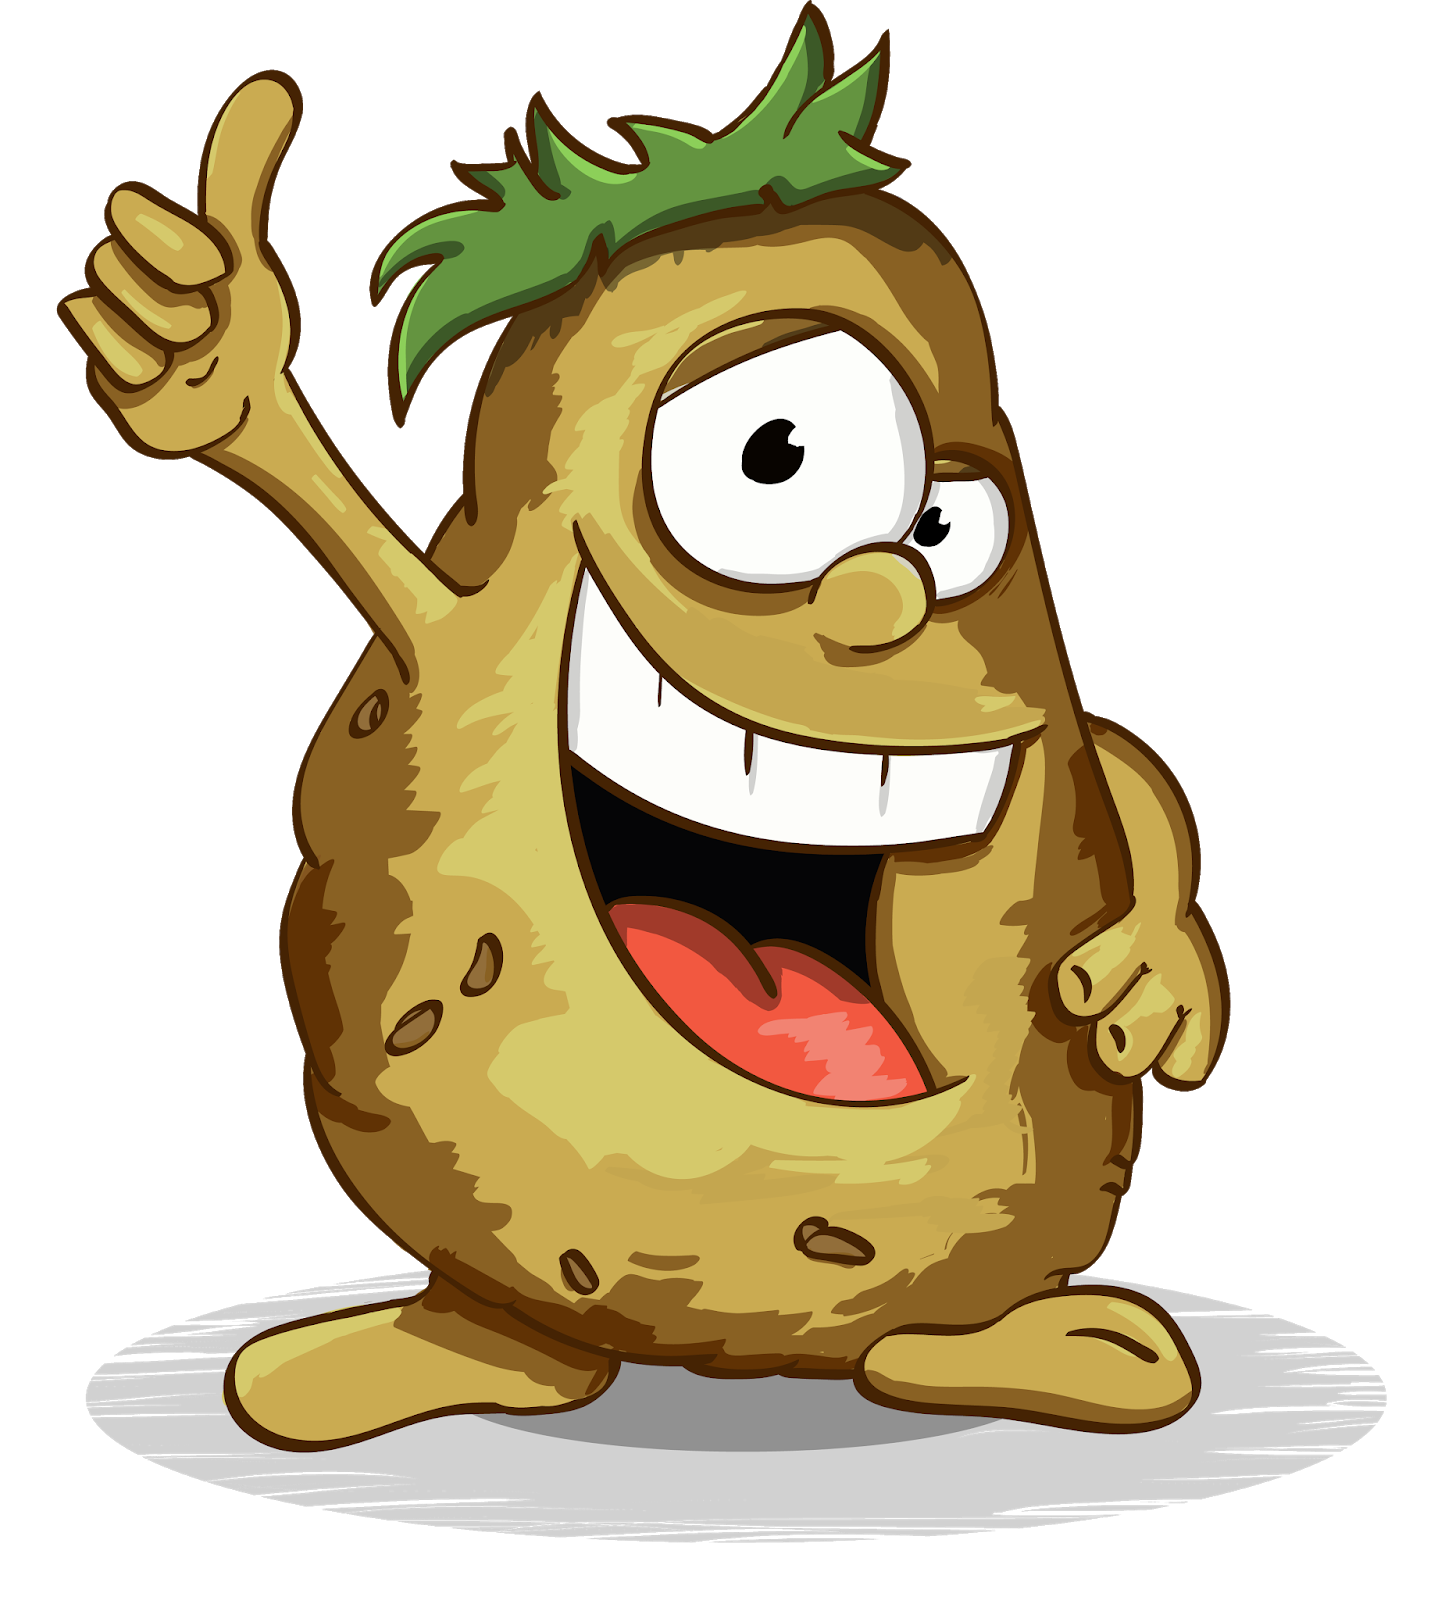 ziemniak-potatoes-3098865.png